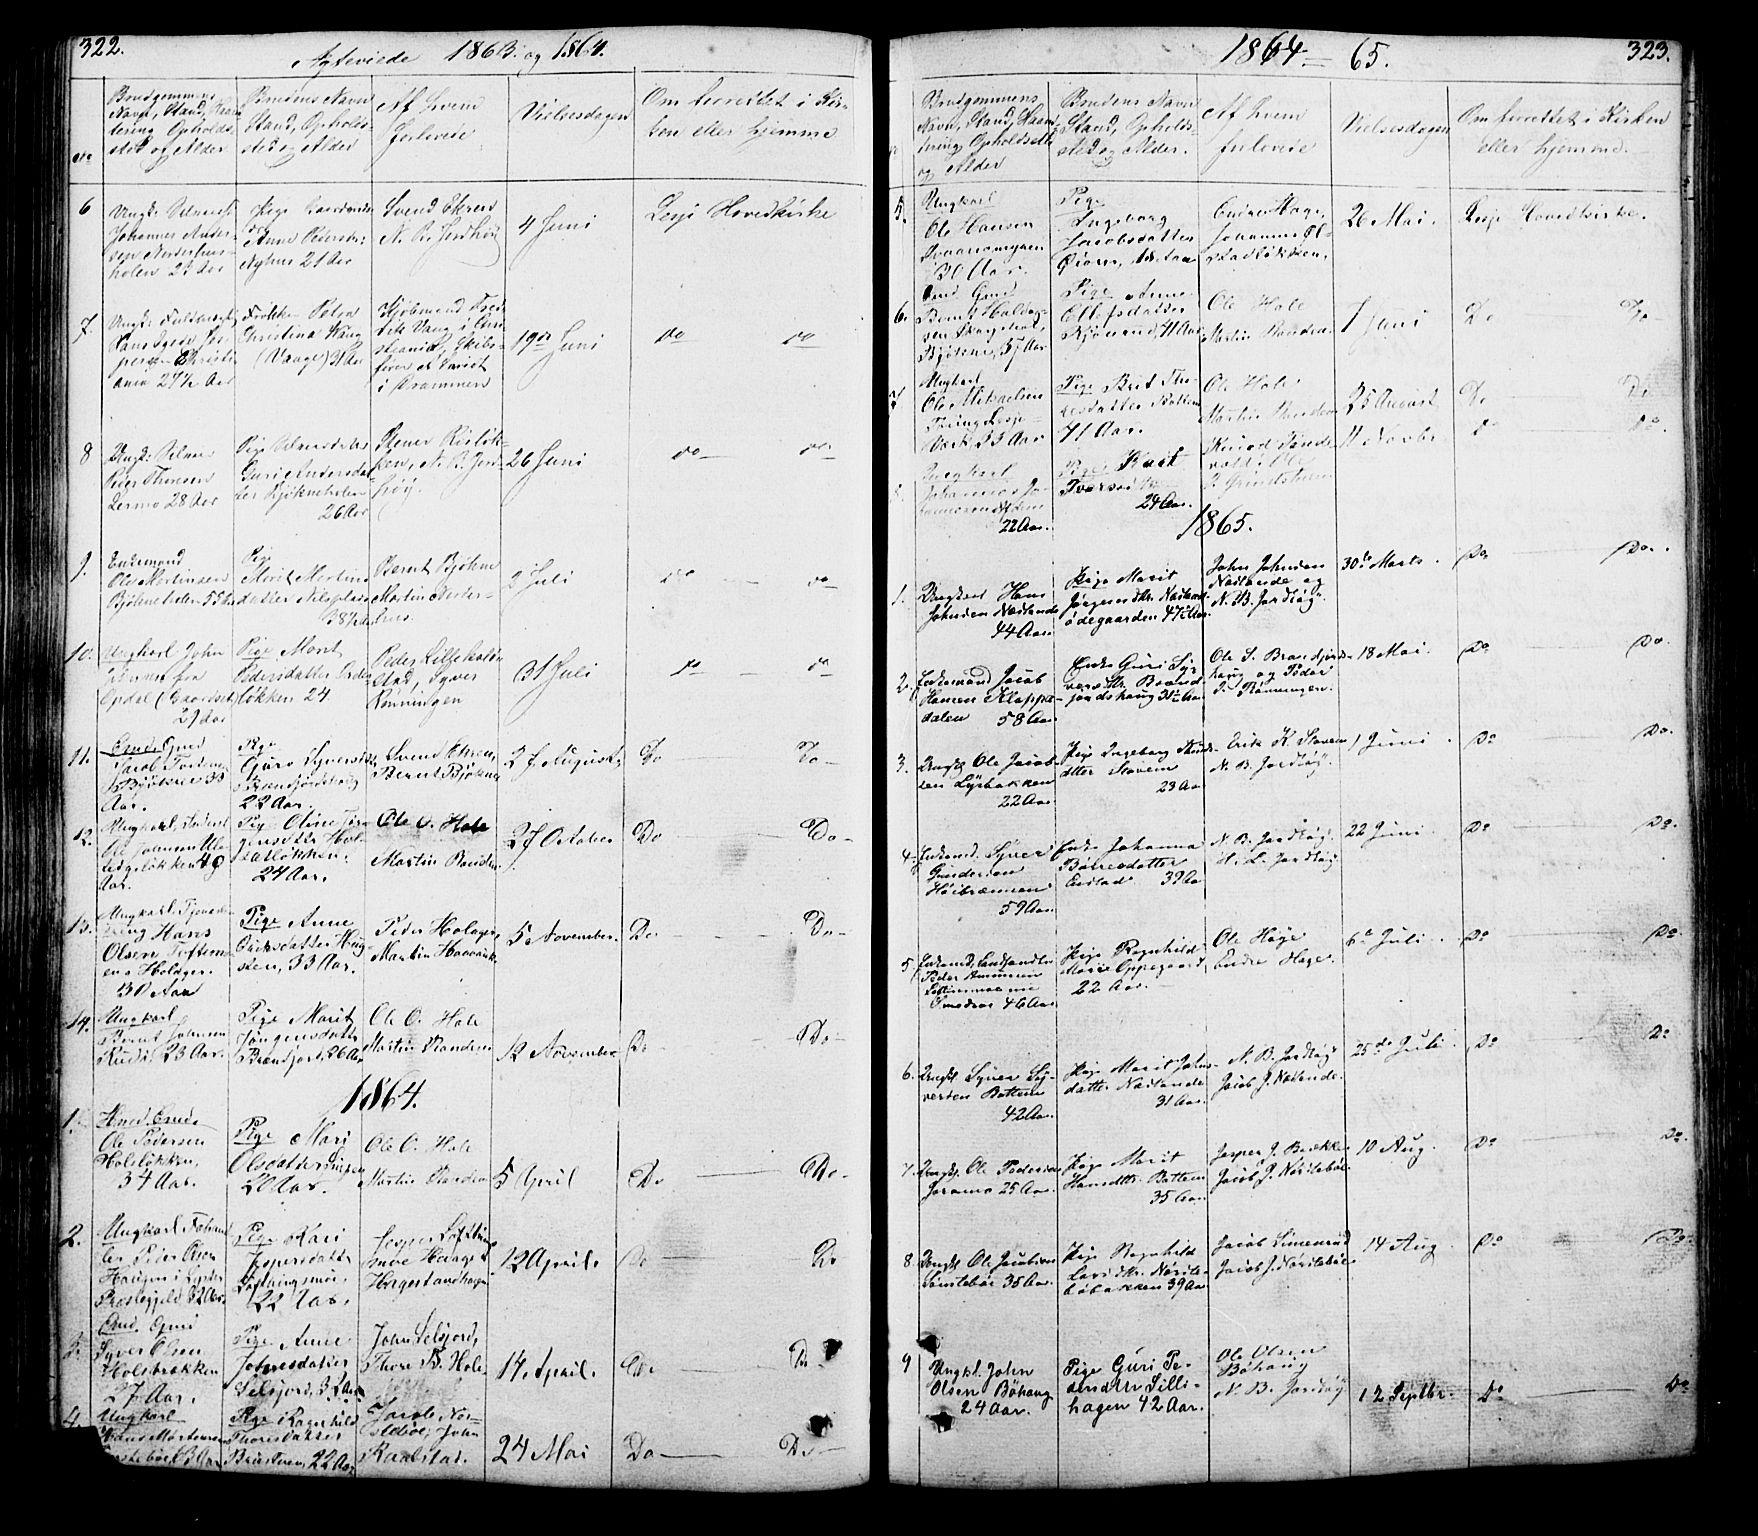 SAH, Lesja prestekontor, Klokkerbok nr. 5, 1850-1894, s. 322-323